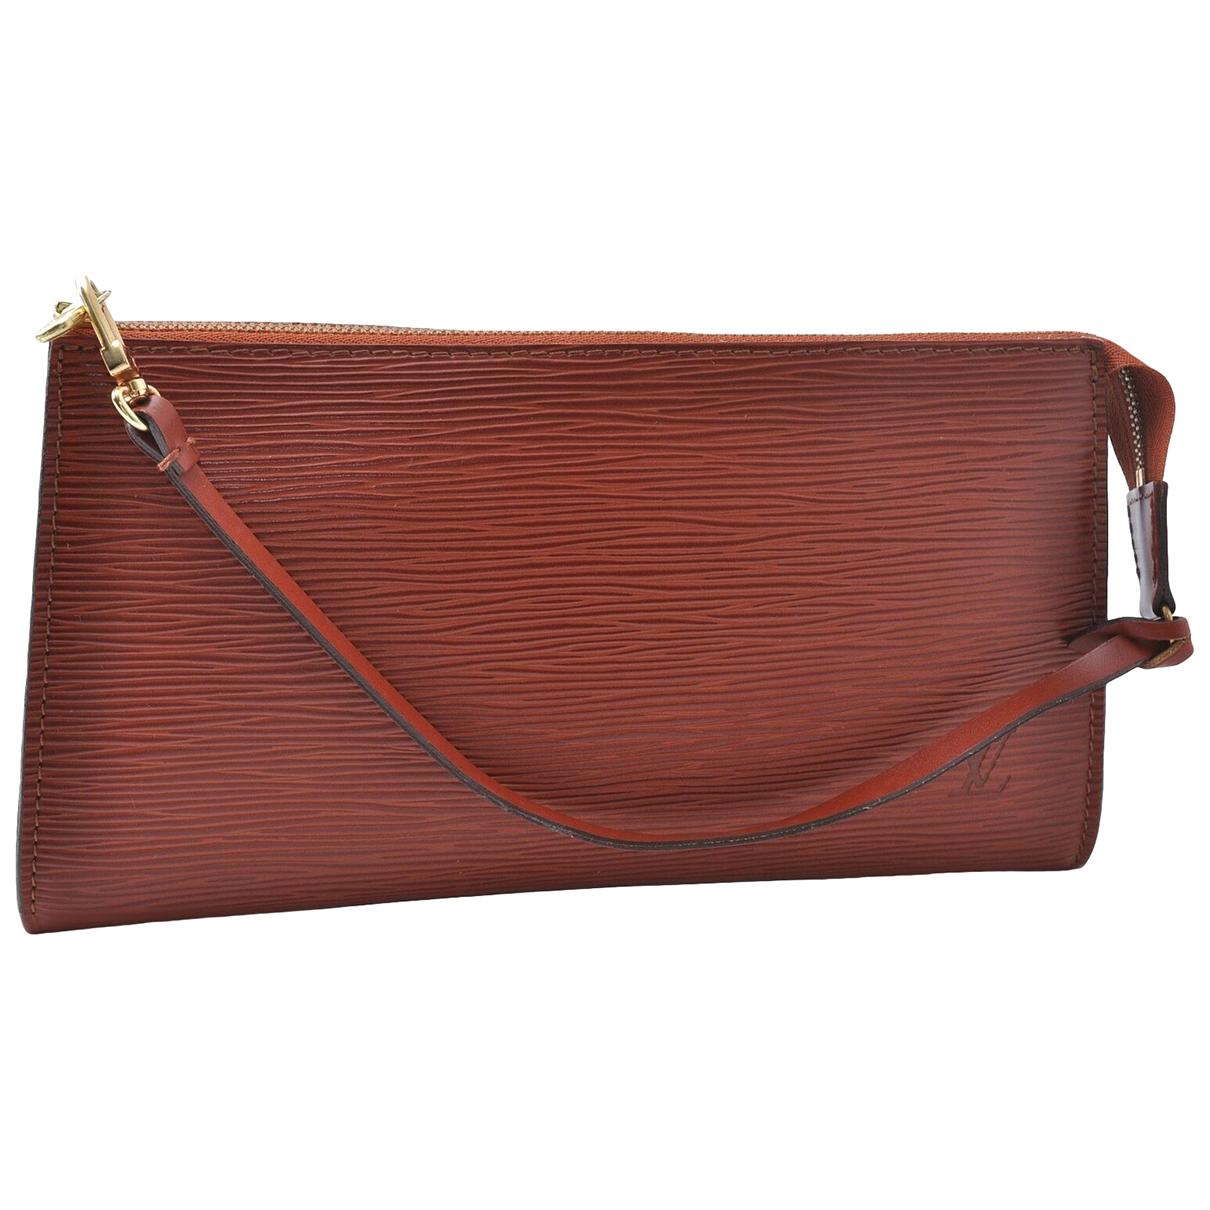 Louis Vuitton N Brown Leather Clutch bag for Women N